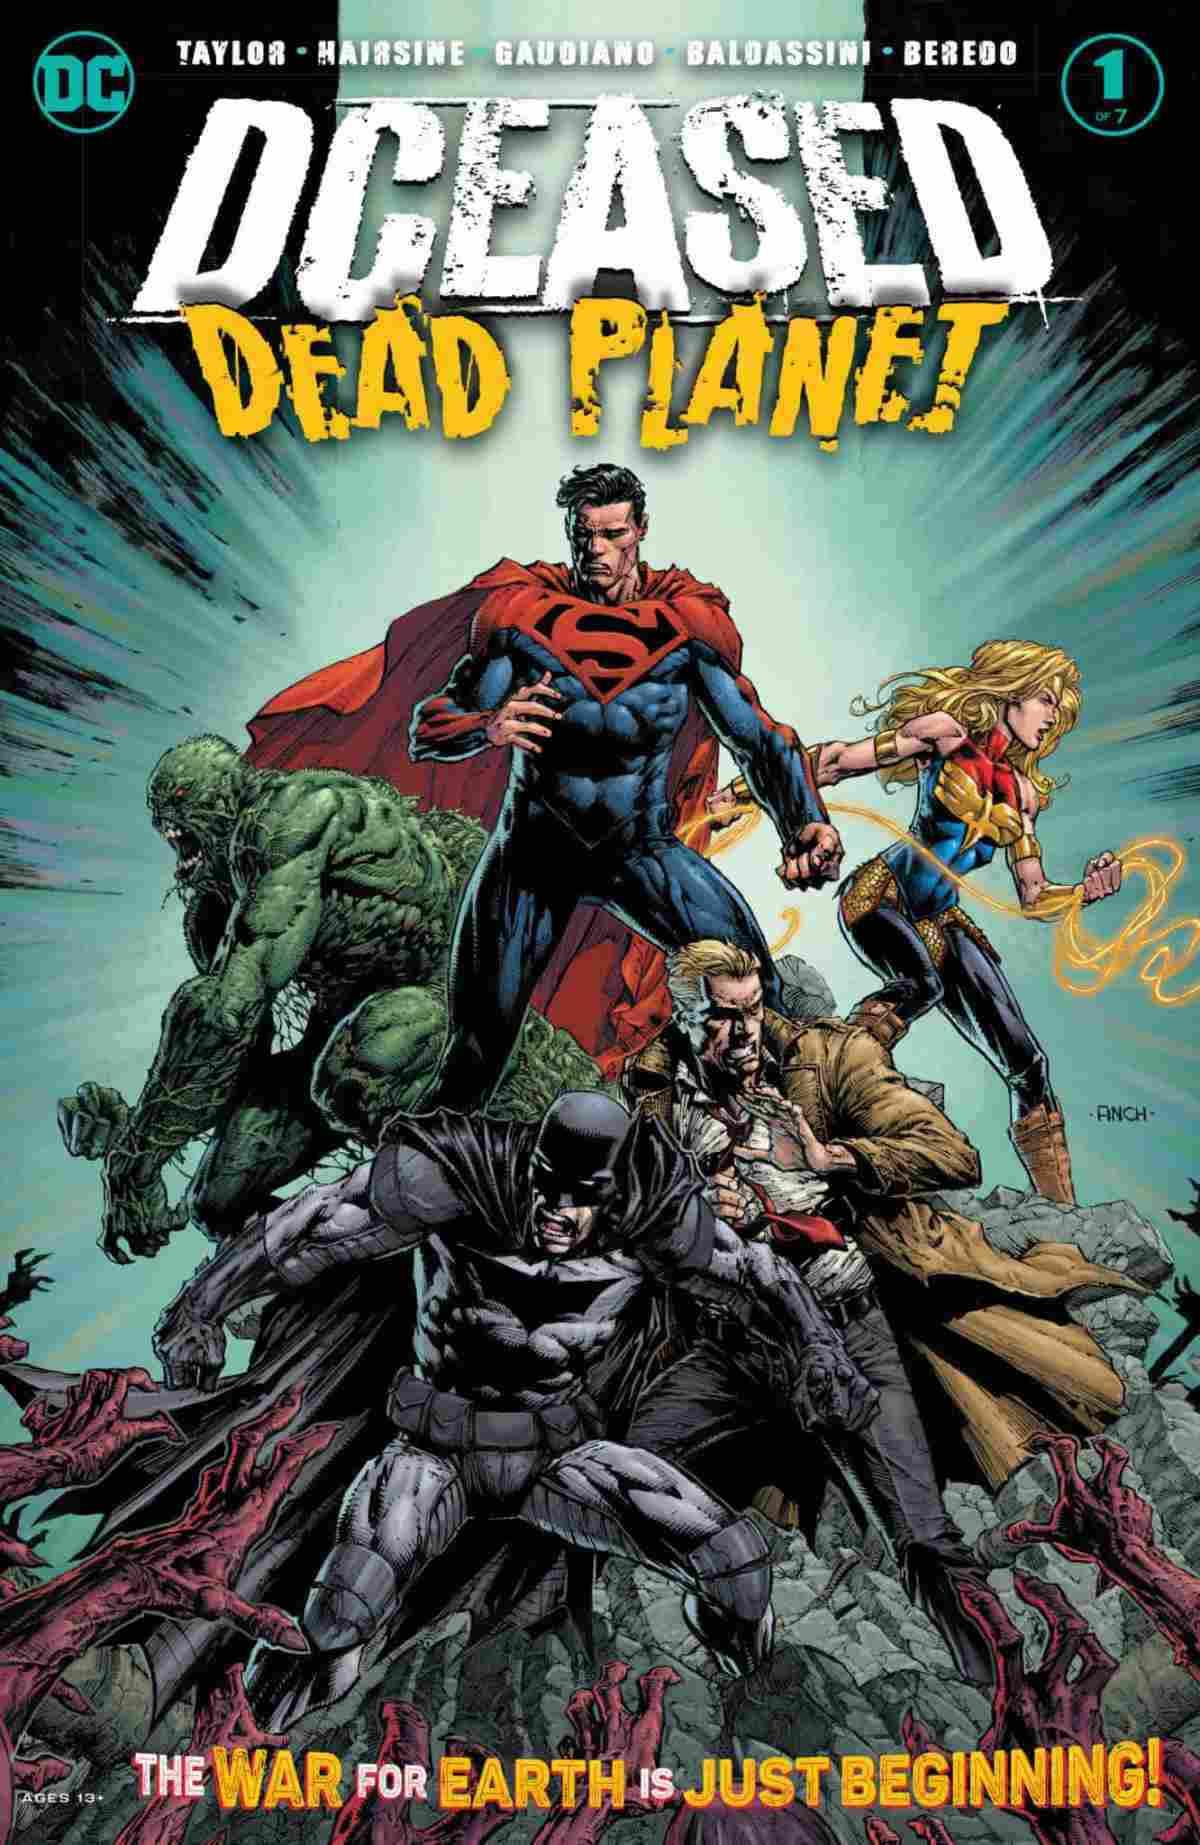 DCeased Dead Planet #1